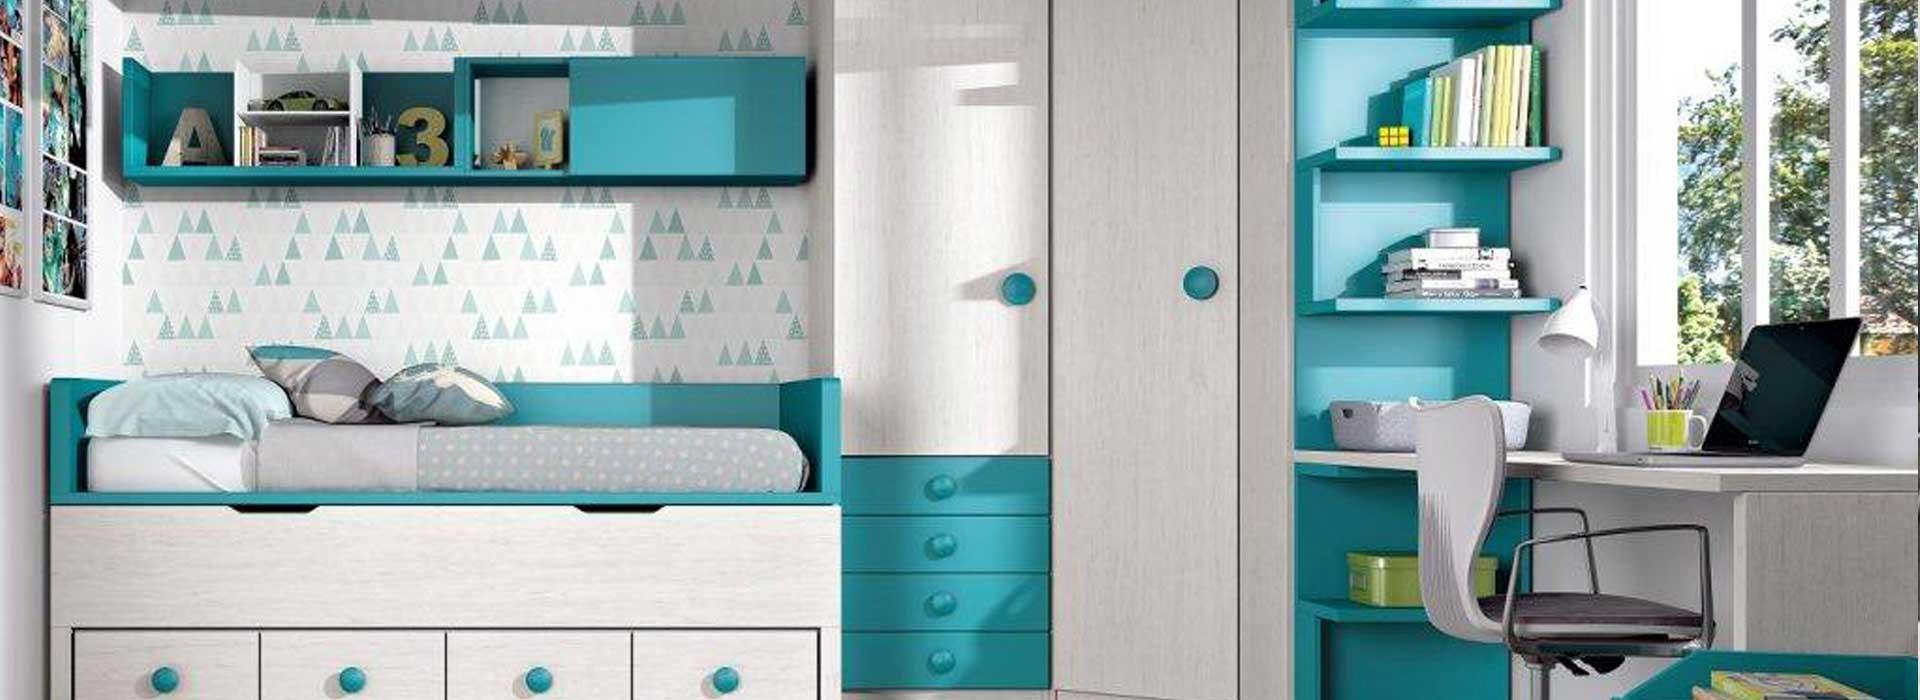 Comprar dormitorios juveniles en Murcia